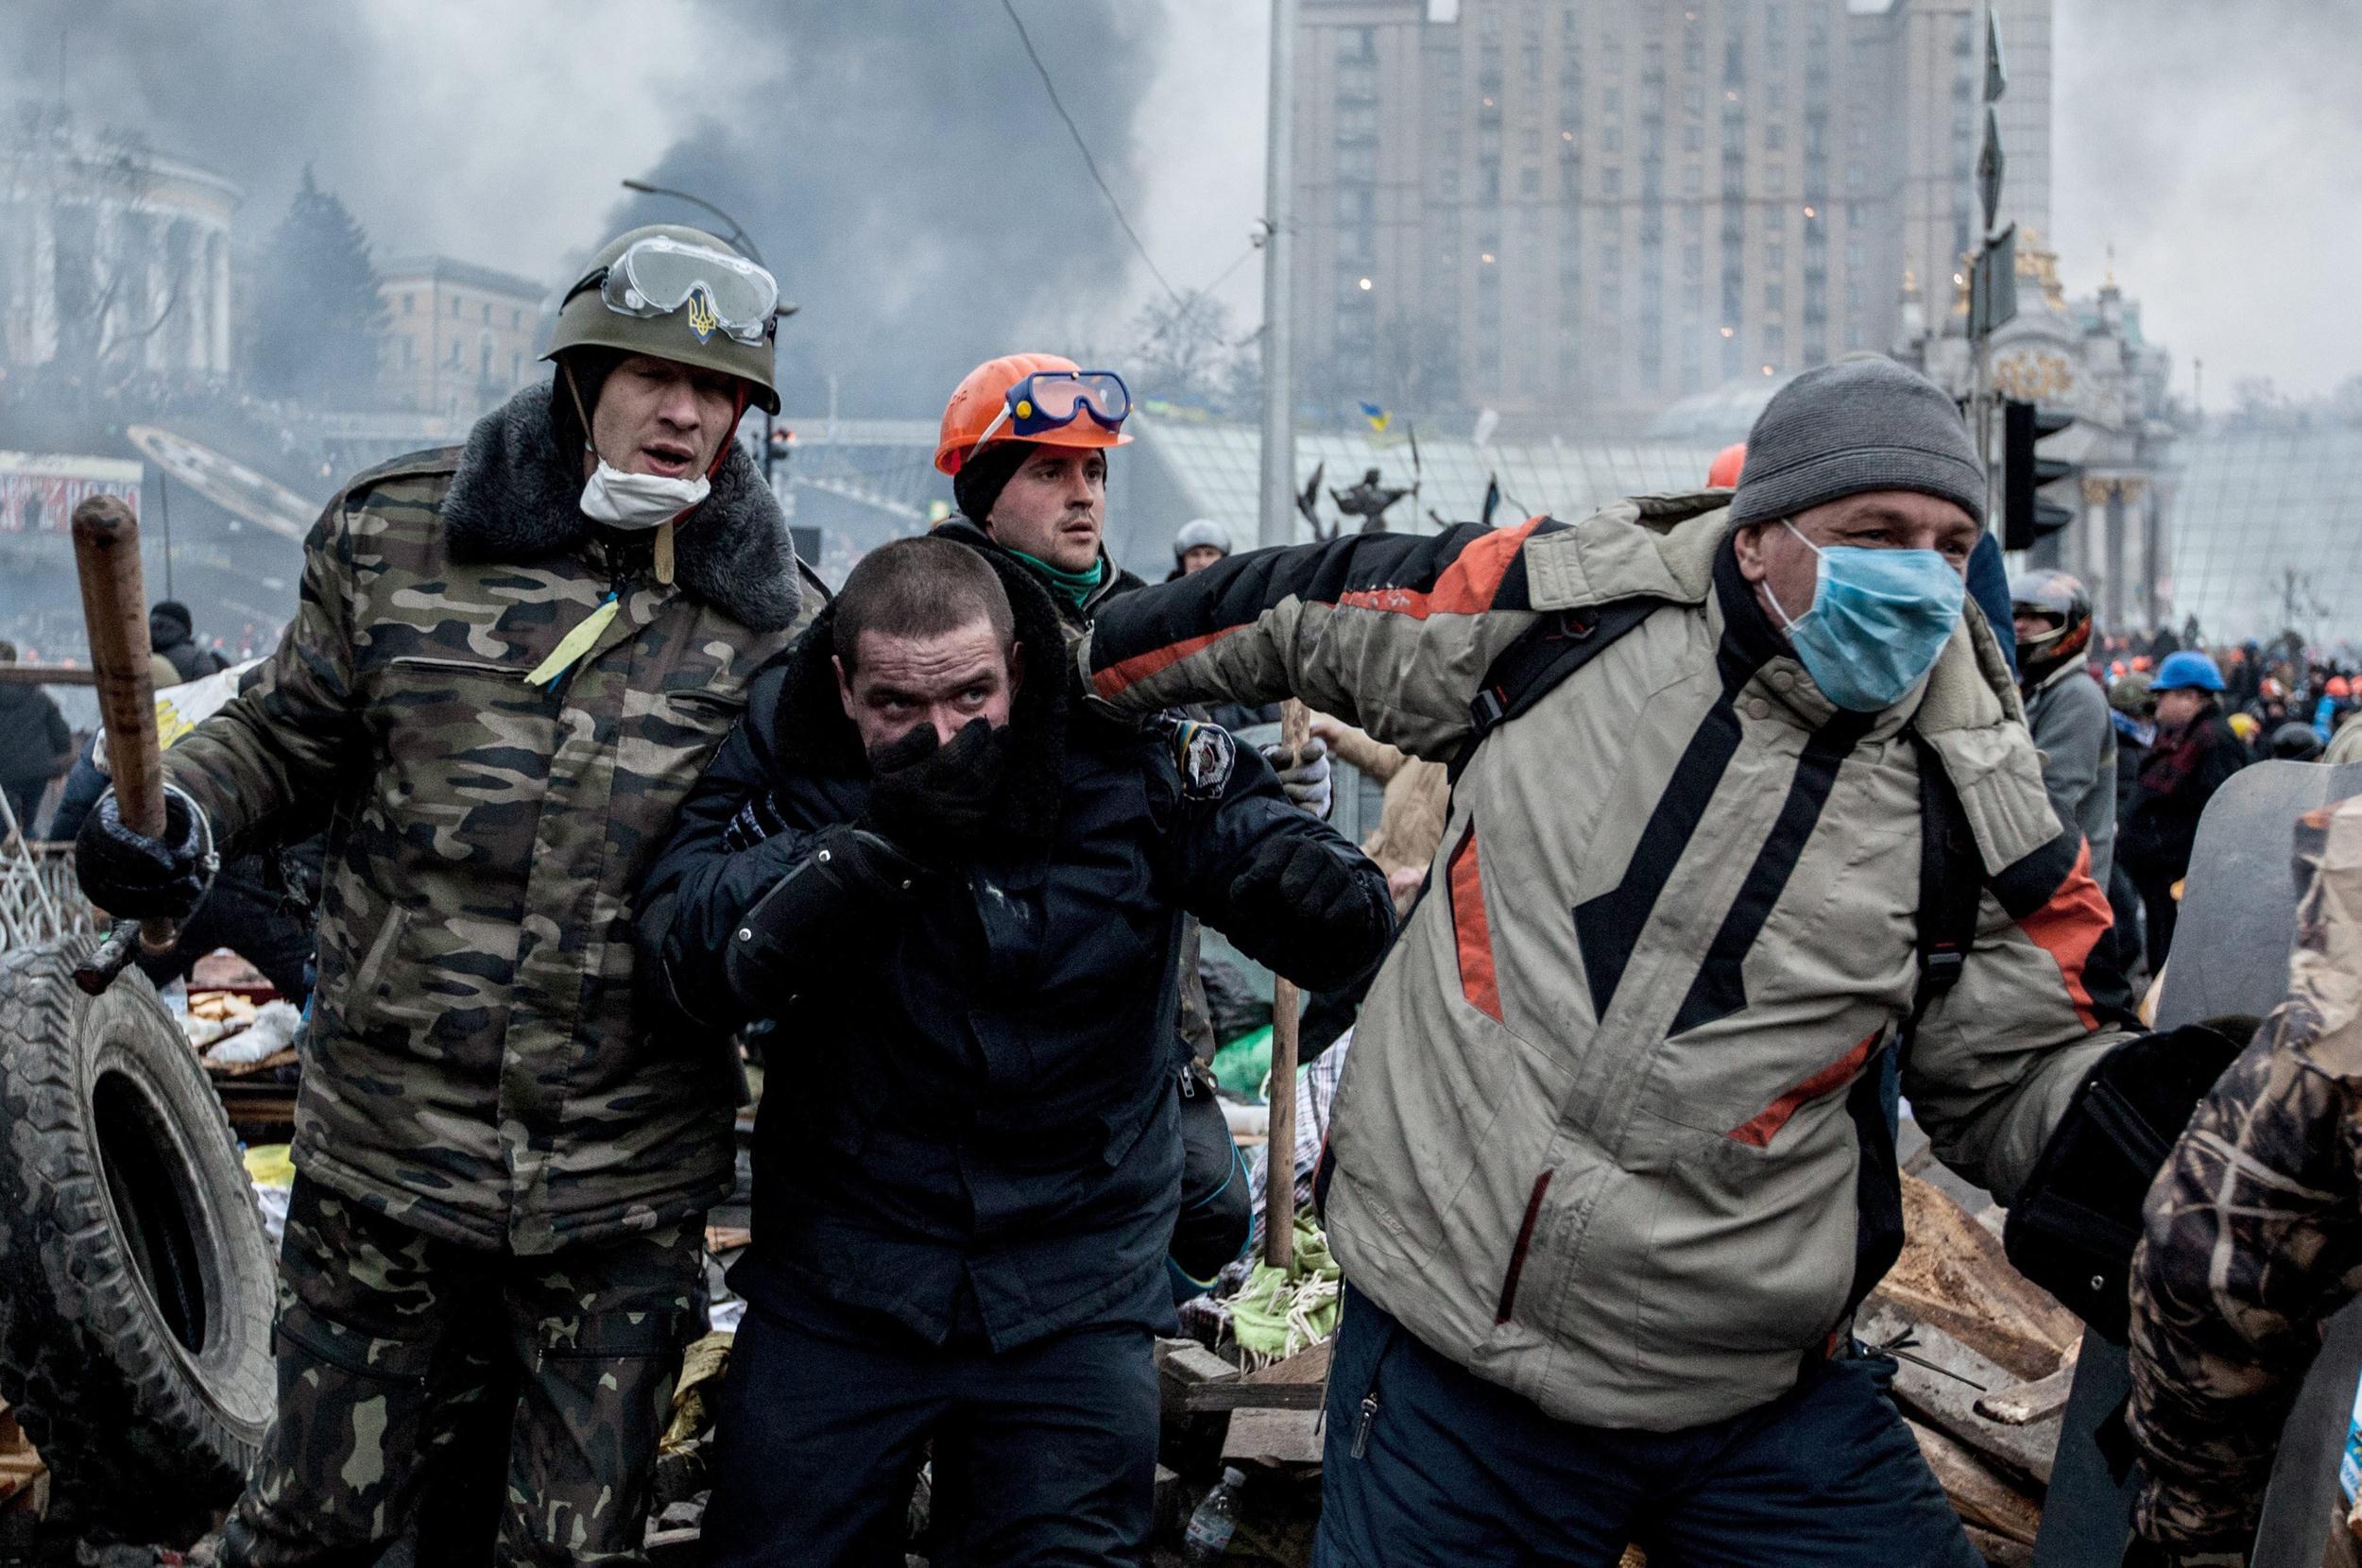 Image: Anti-government demonstrators escort a captured police officer in Kiev